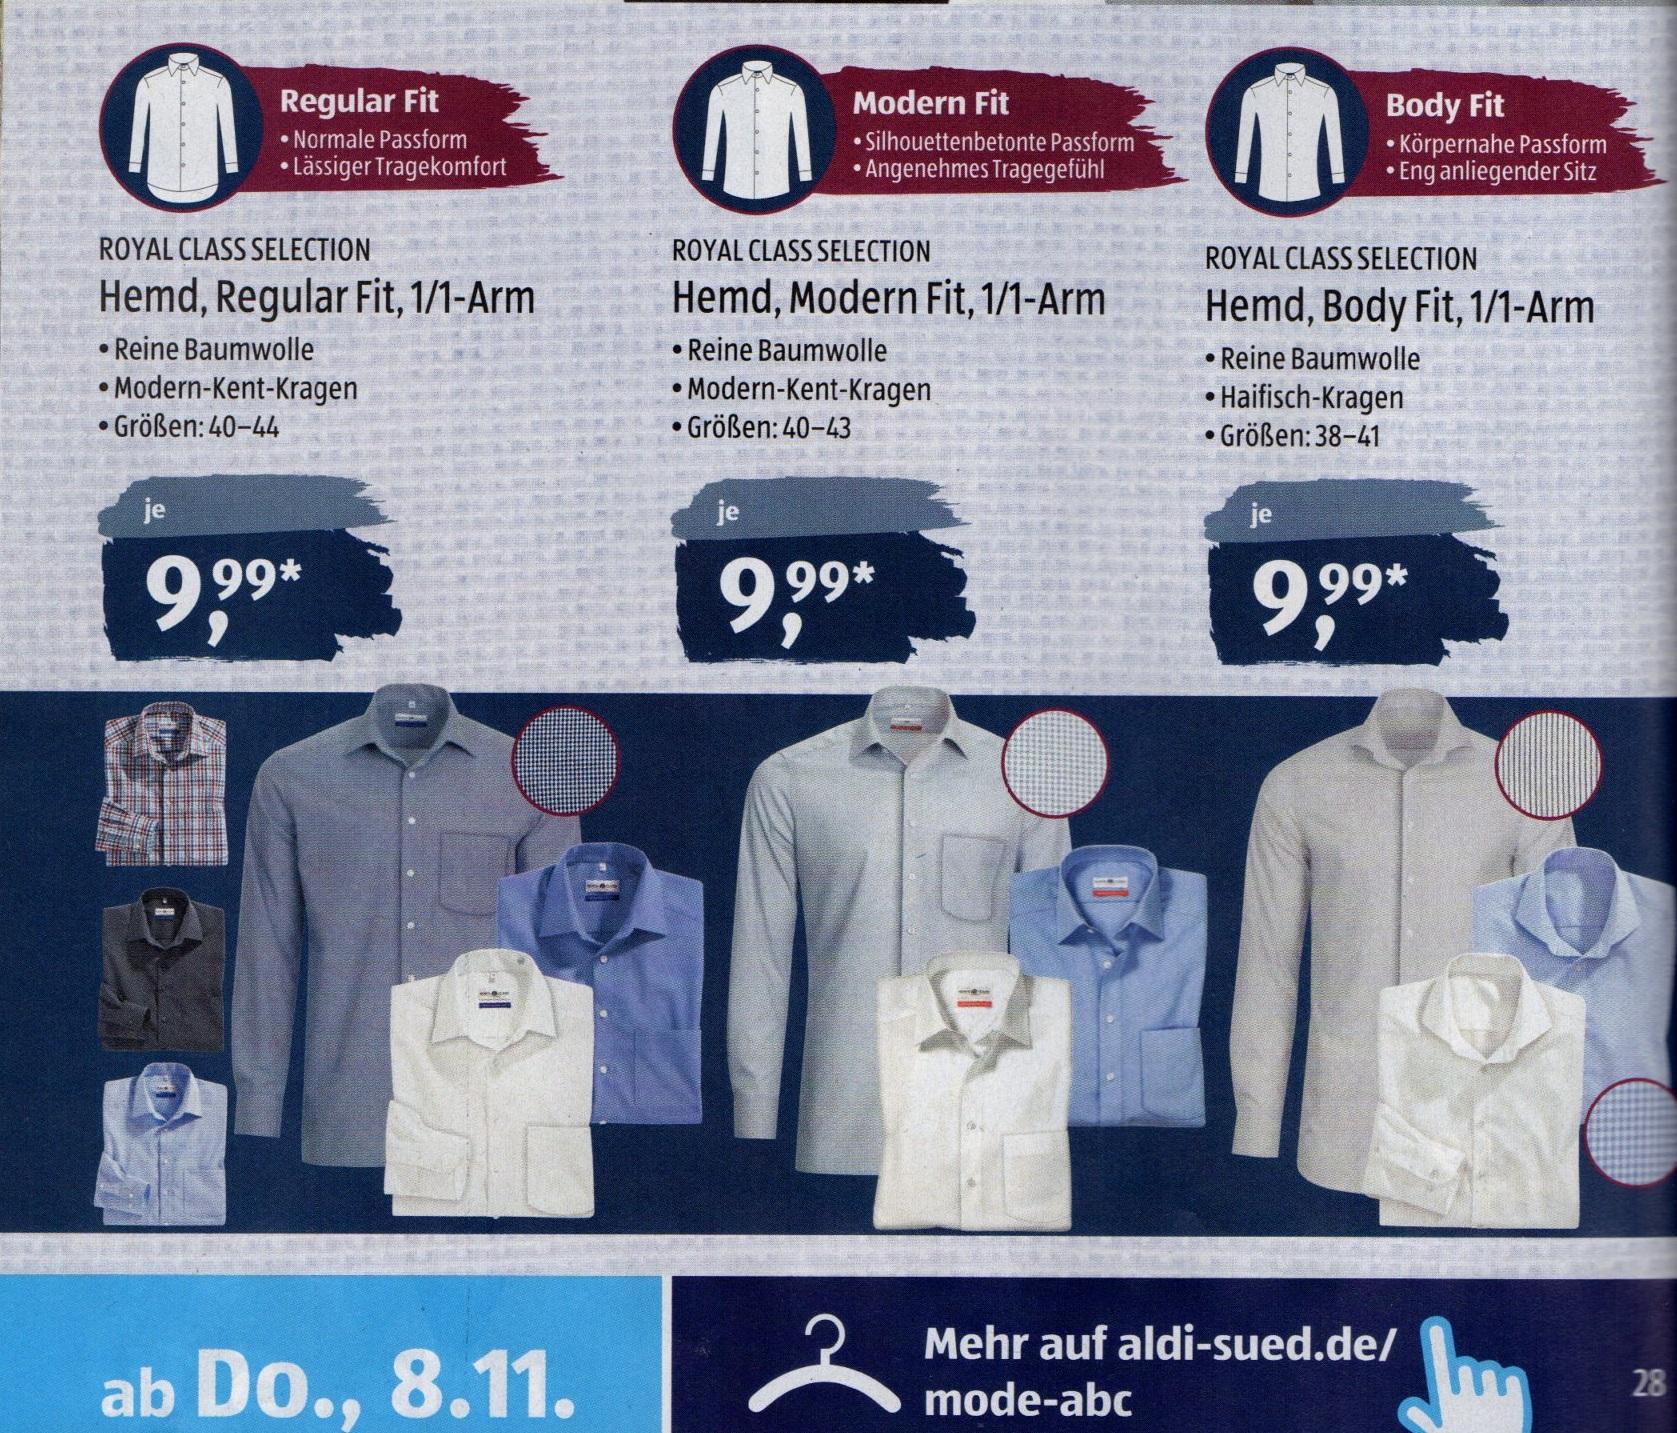 [offl./Aldi Süd] Royal Class Selection Hemden regular/modern/body fit [ab 8.11.]